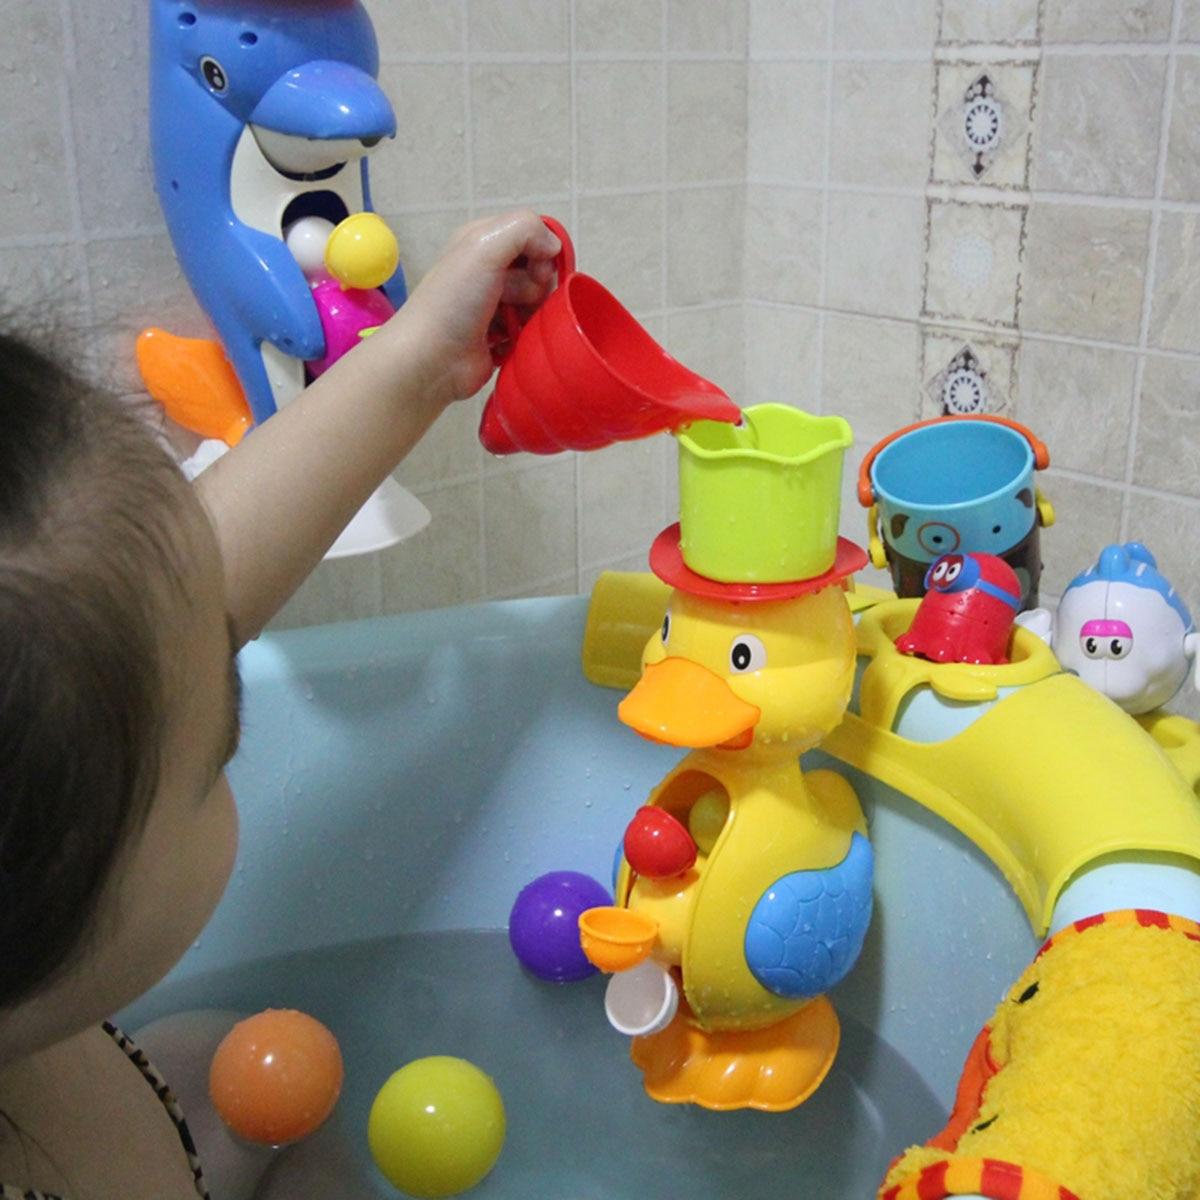 LCLL-1Pcs baño bebé niños niño baño Agua pulverizadora bañera pato Juguetes